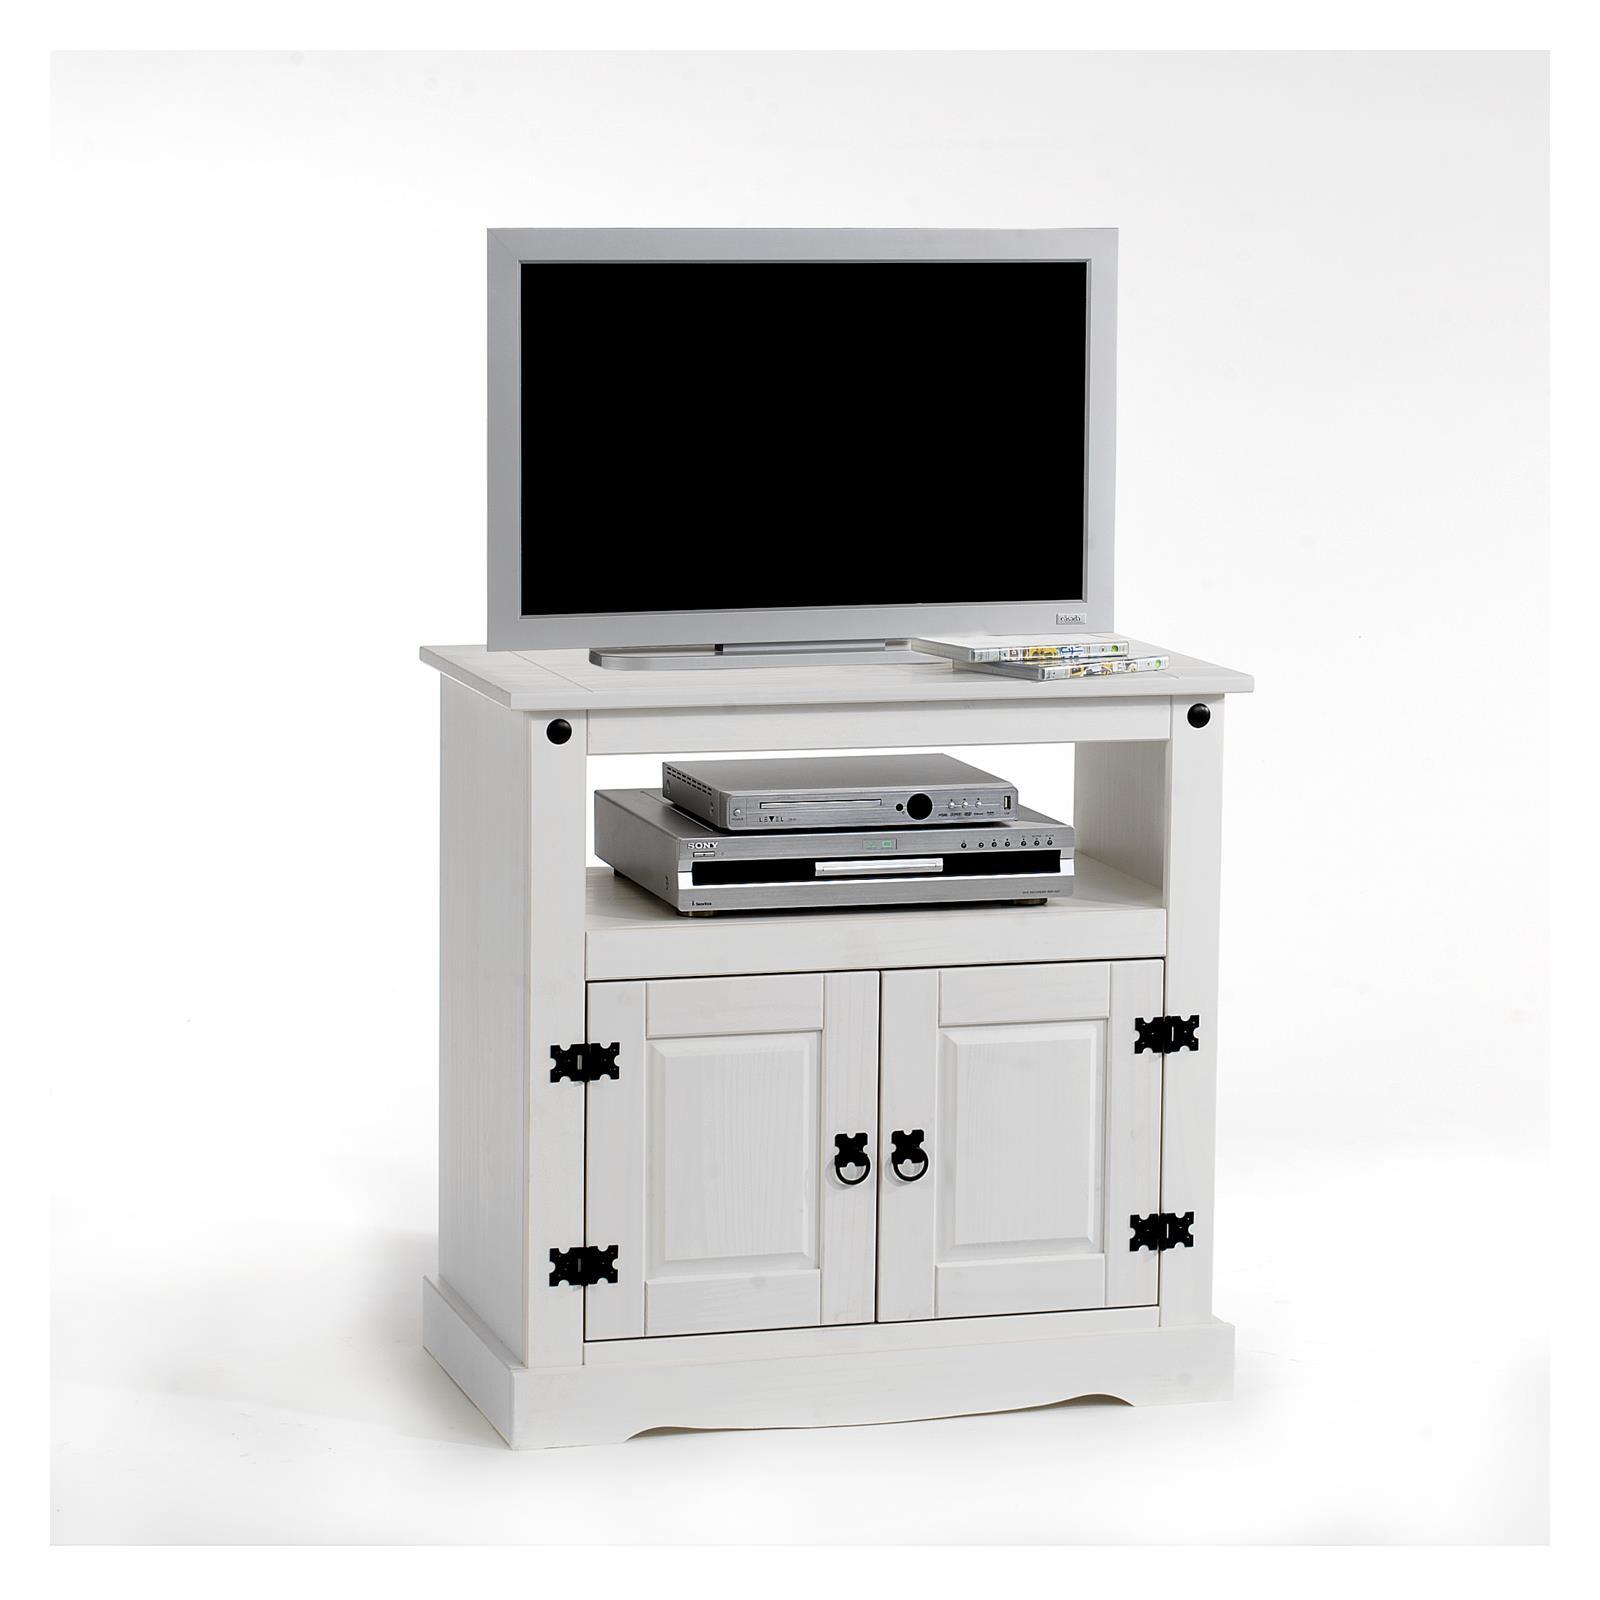 Meuble tv en pin tequila 2 portes 1 niche lasur blanc - Meuble tv pin blanc ...